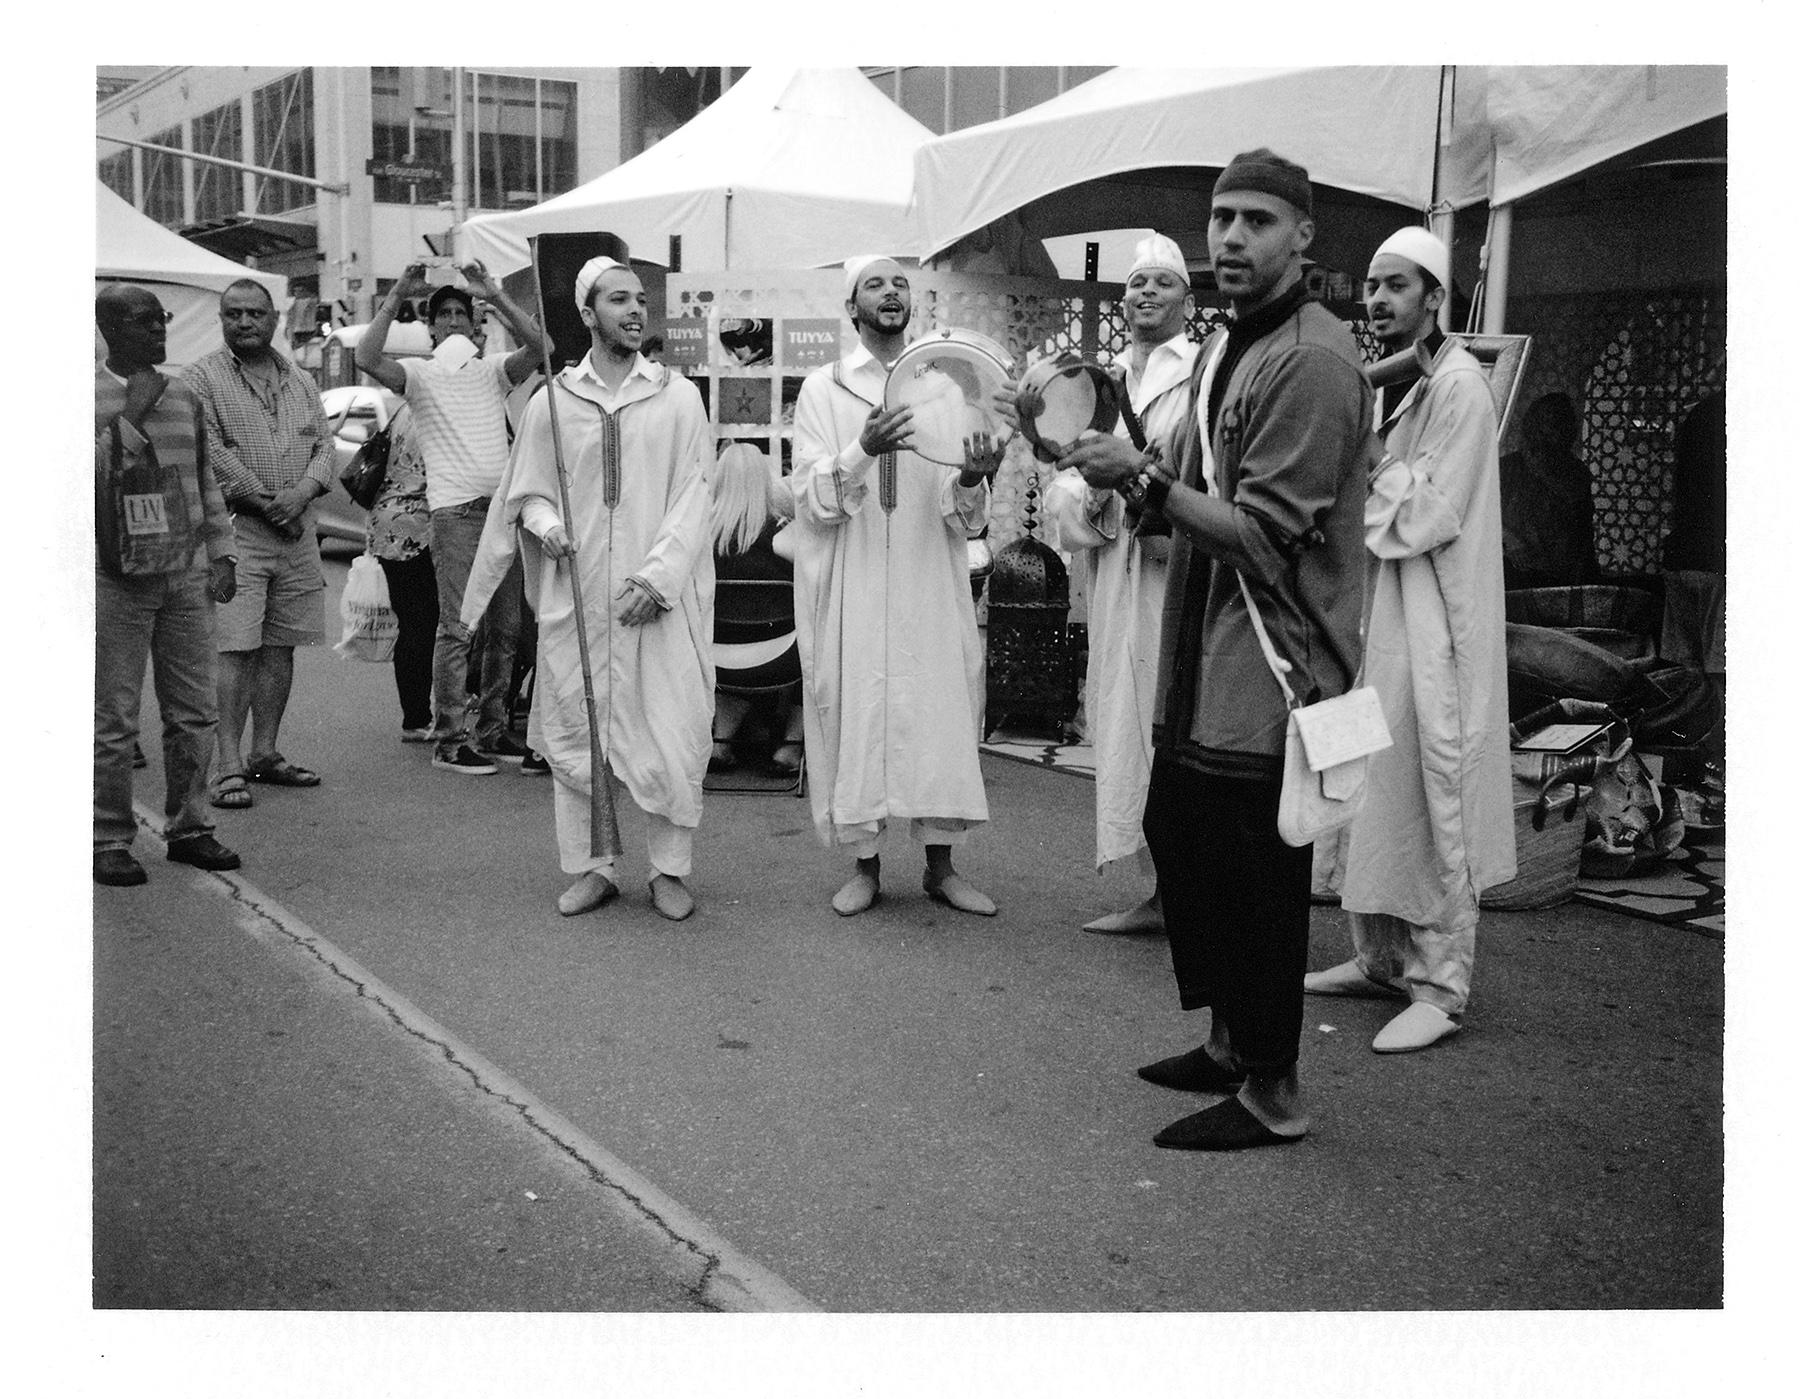 Moroccan Band  Polaroid Land Camera   Fuji Film FP-3000b   Howard Sandler